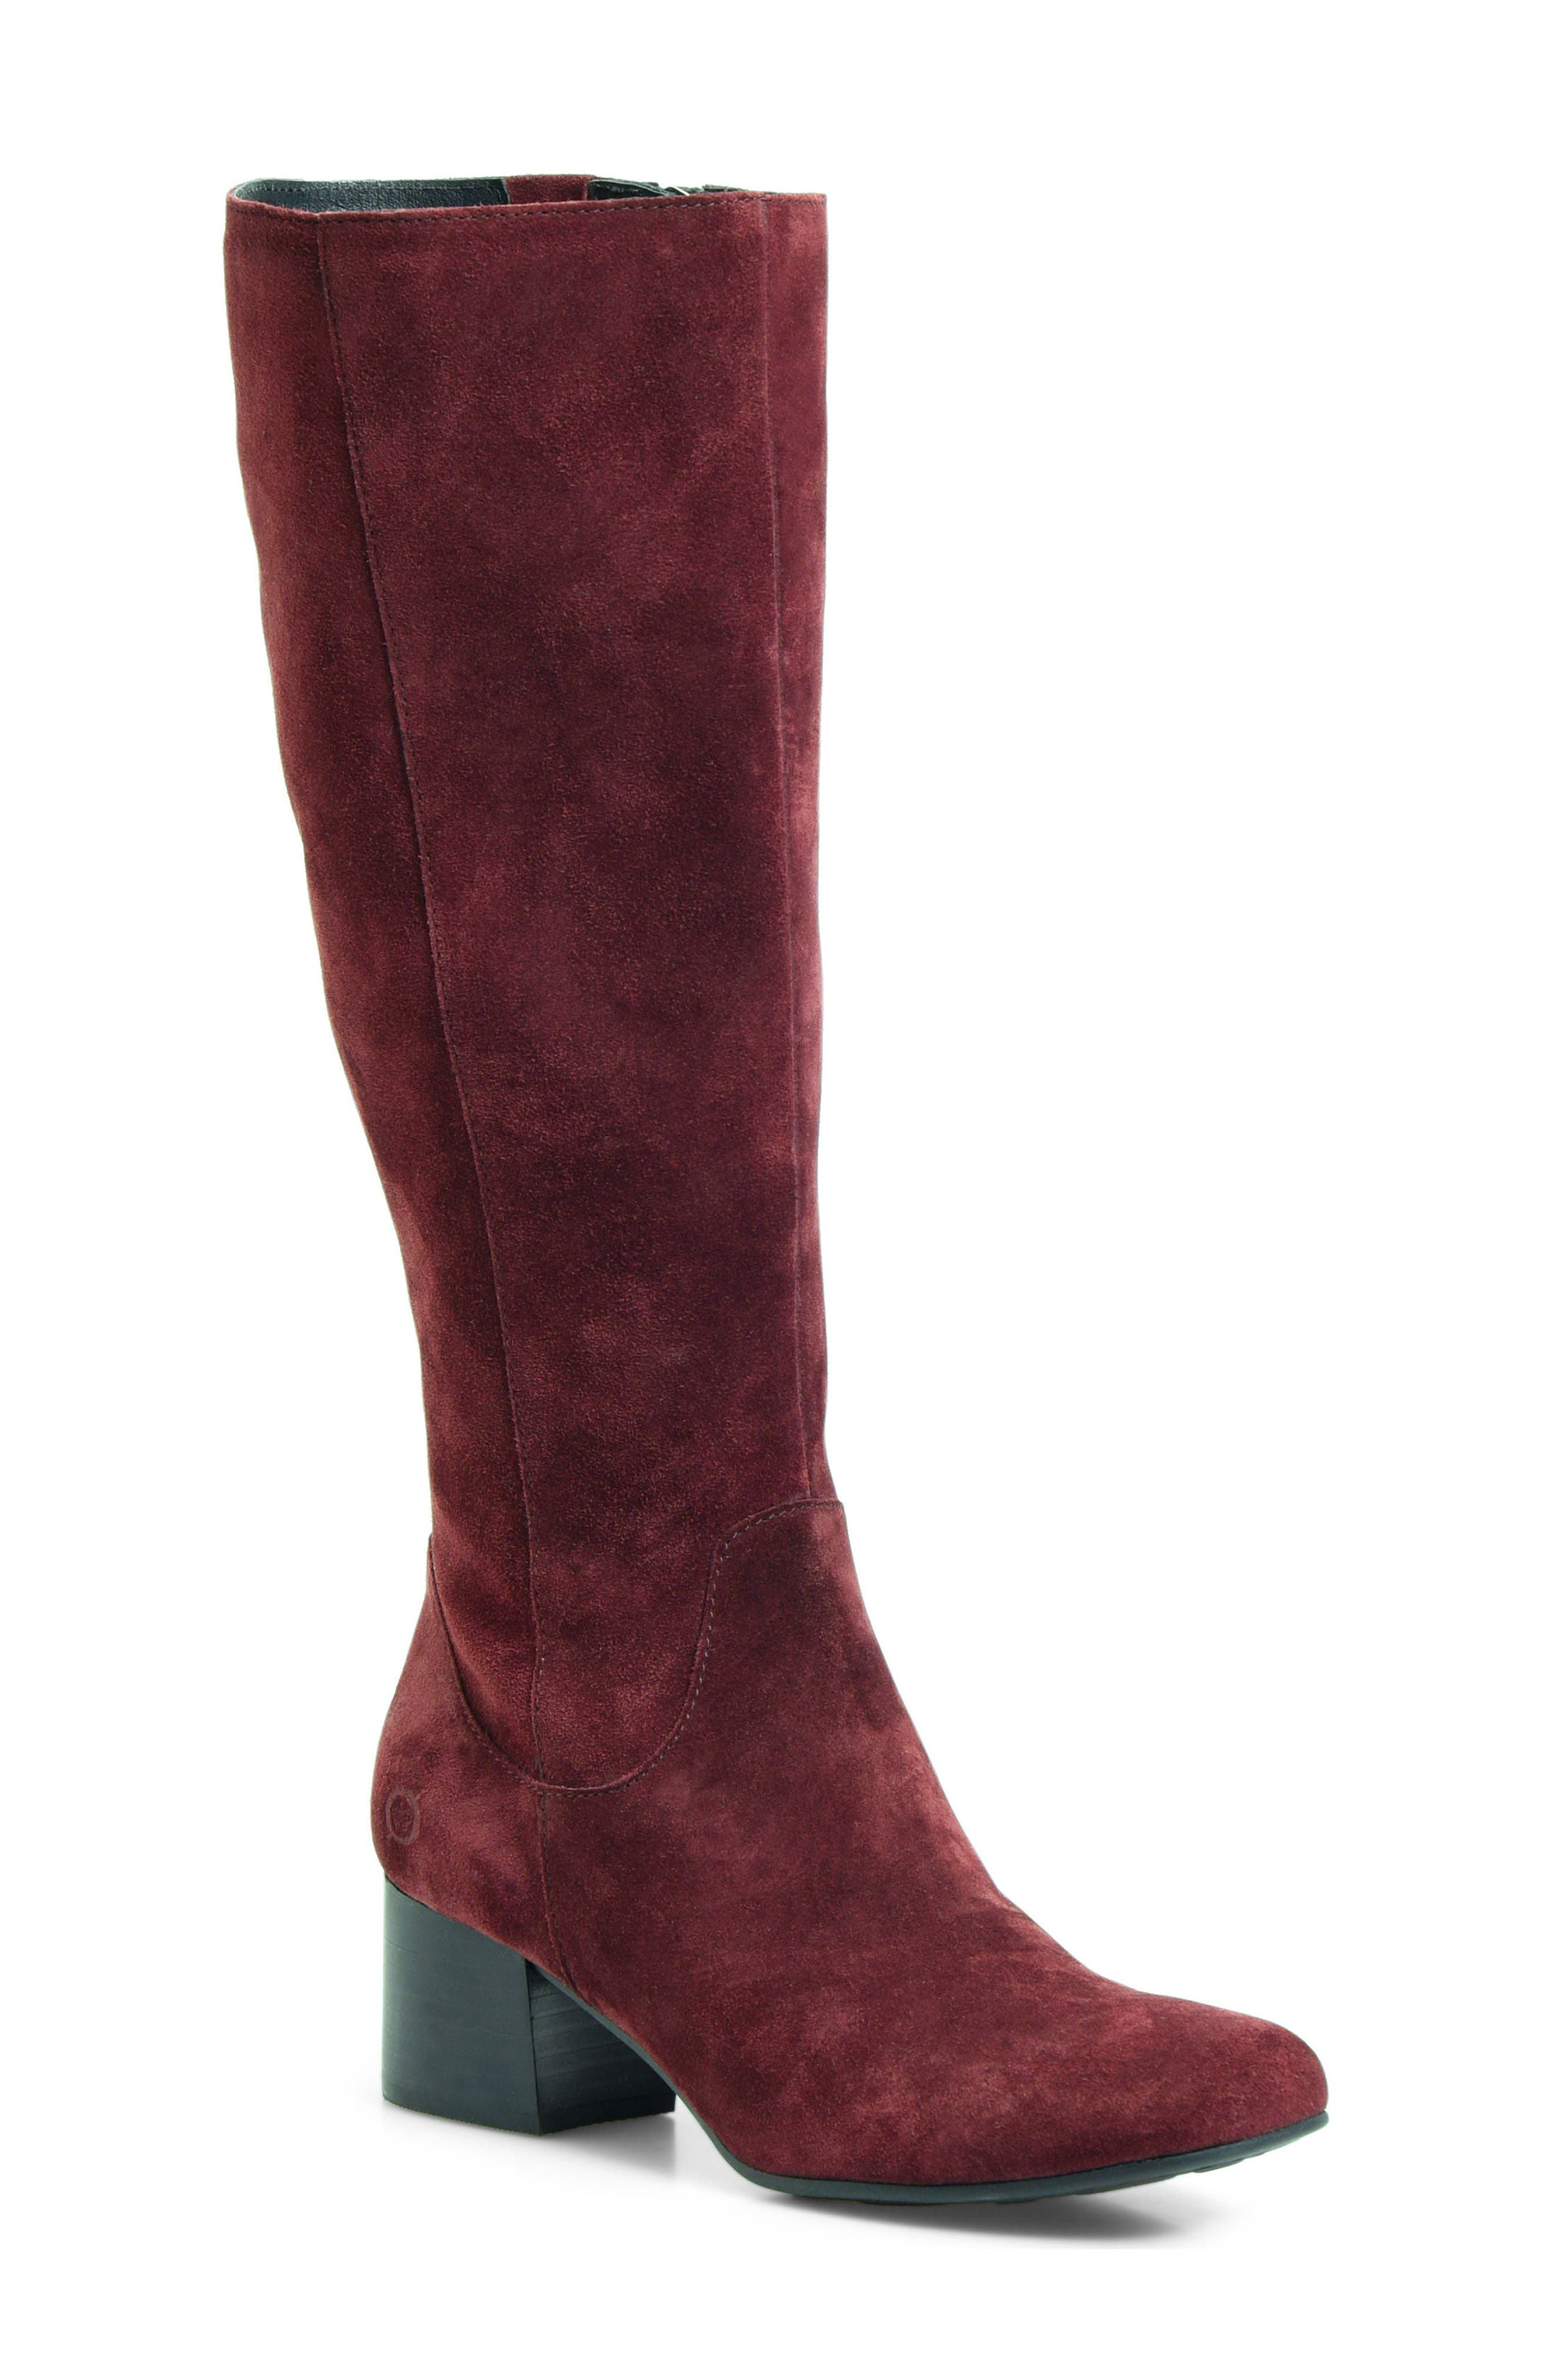 Alternate Image 1 Selected - Børn Avala Knee High Boot (Women)